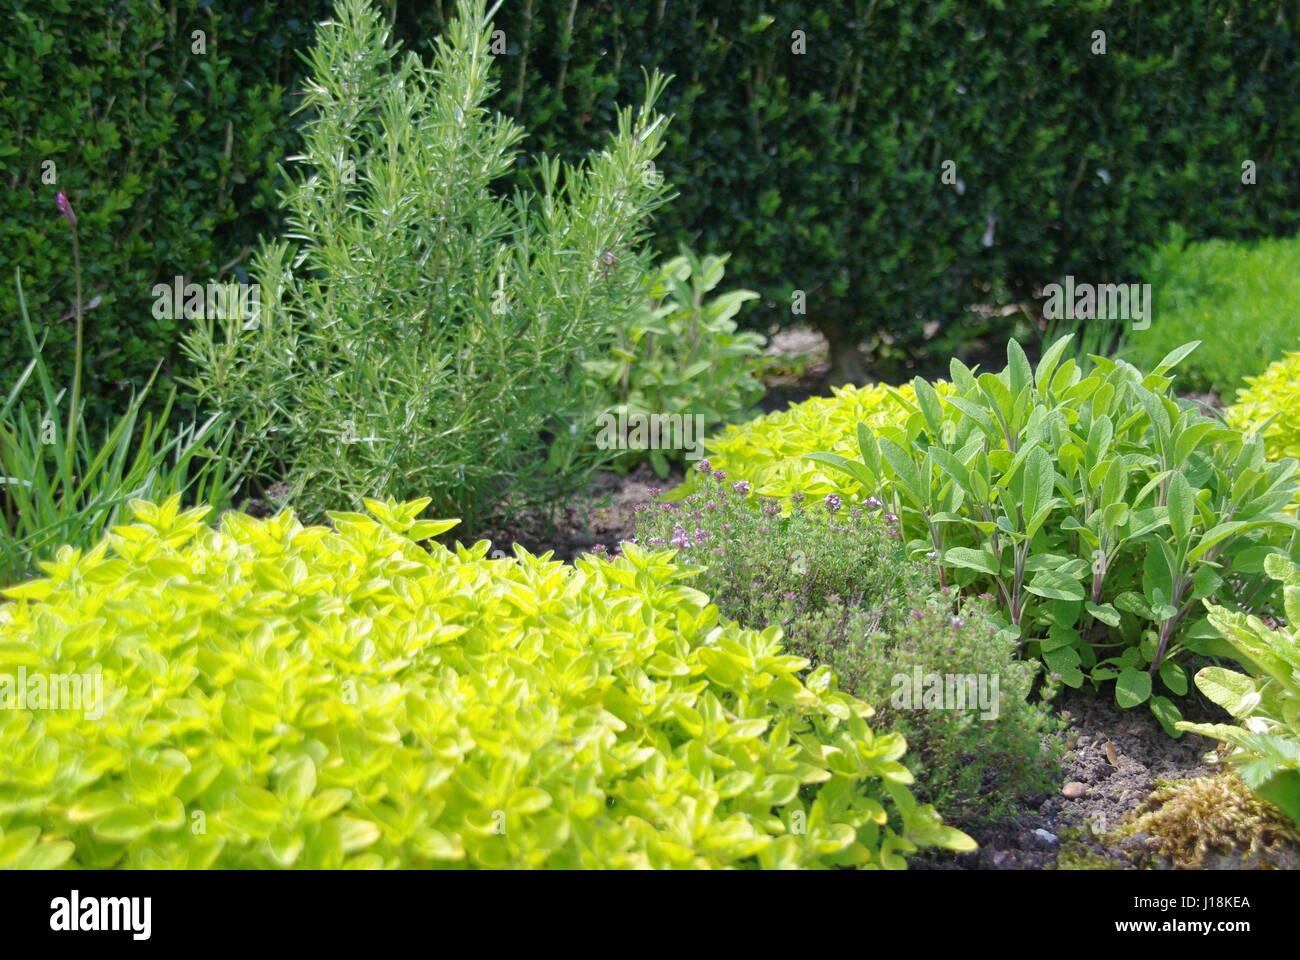 Garden Herbs - Stock Image